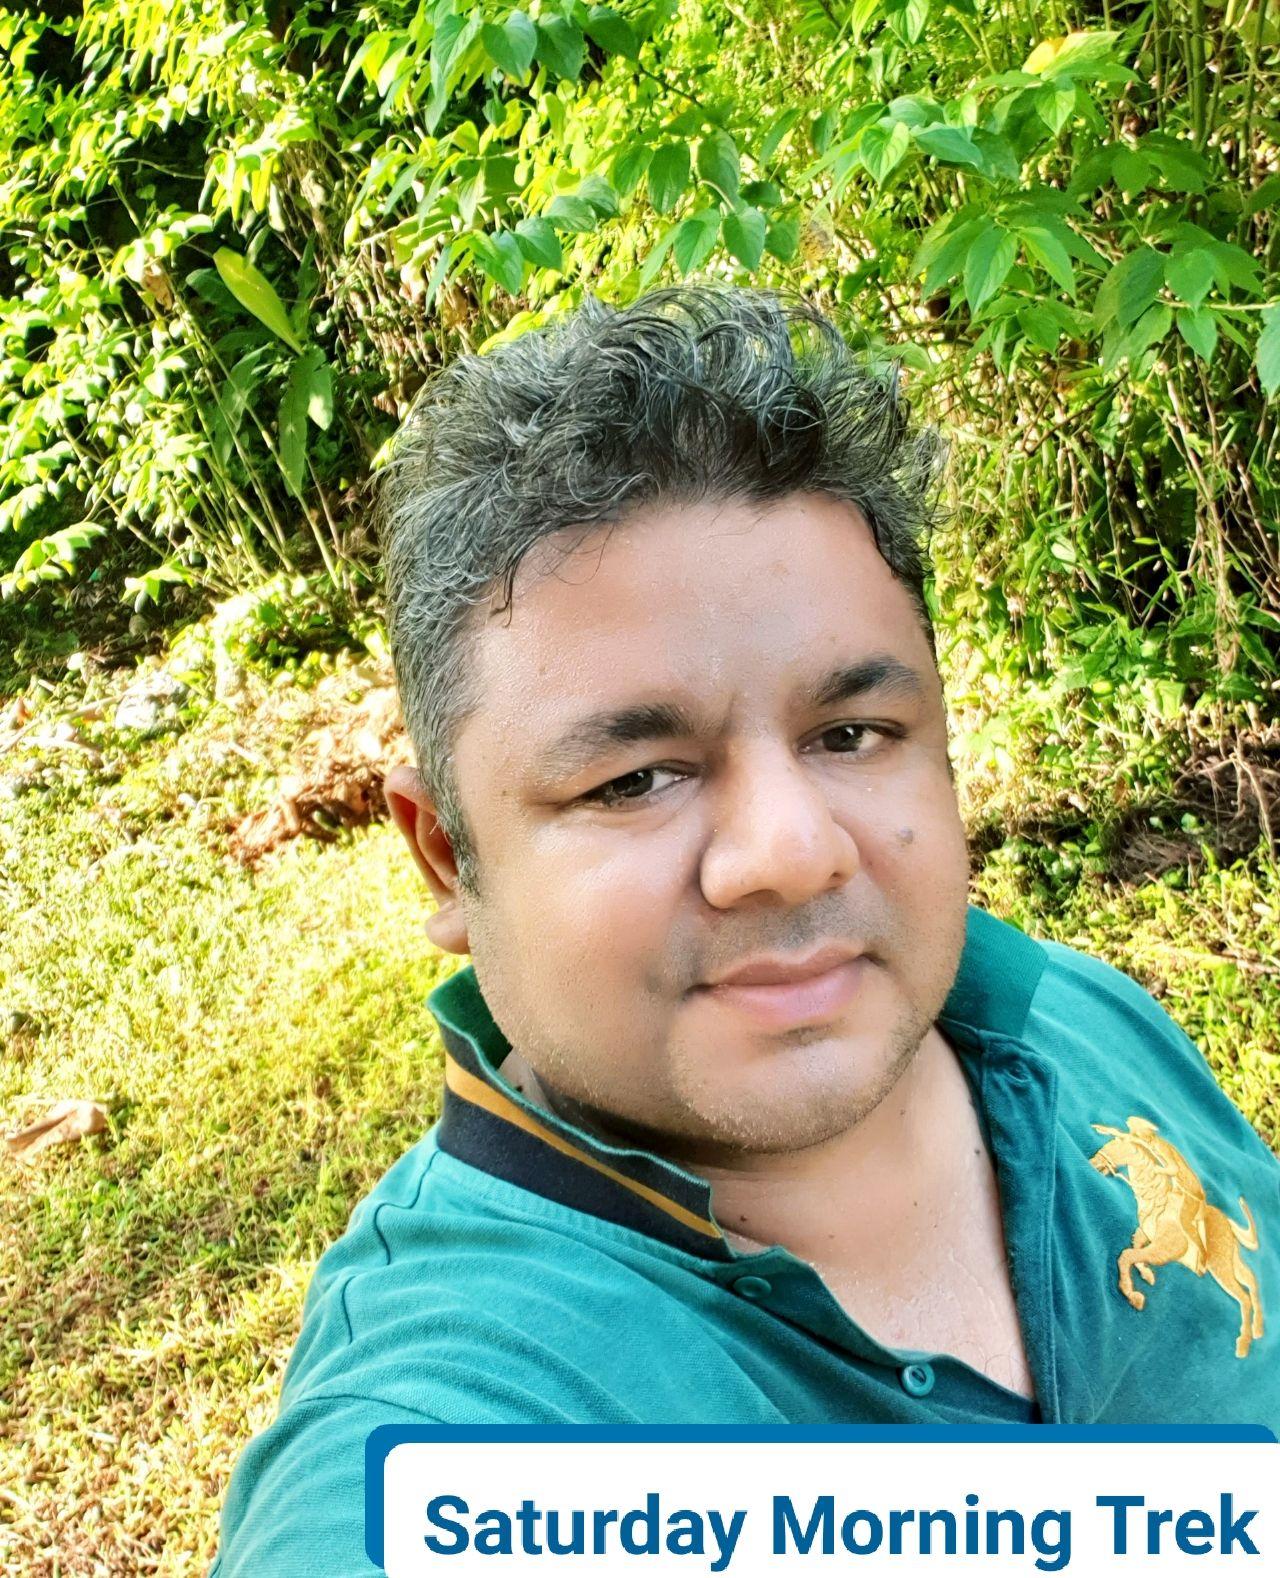 Karunjit Kumar Dhir on LinkedIn: #healthyliving   16 comments